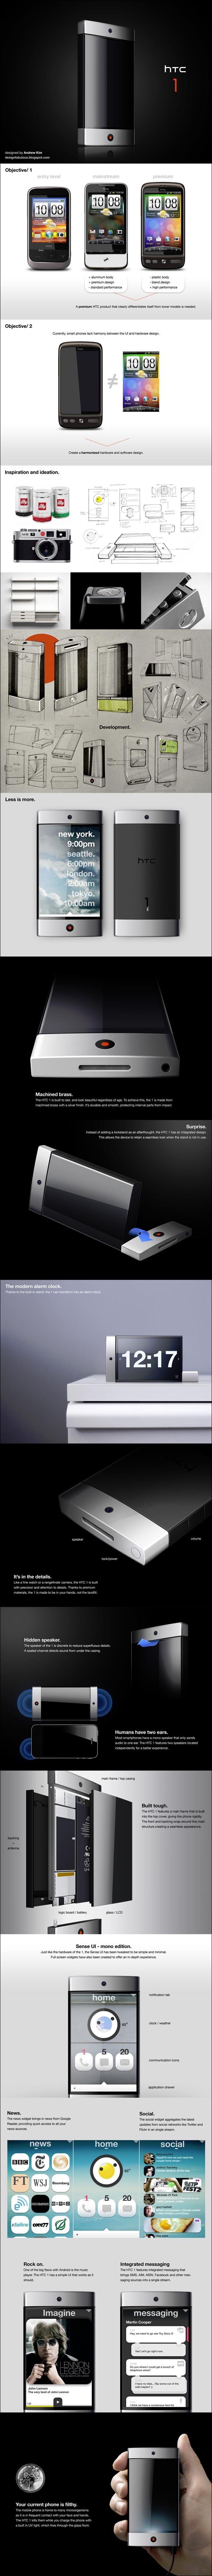 photo design smartphone HTC 1 one concept